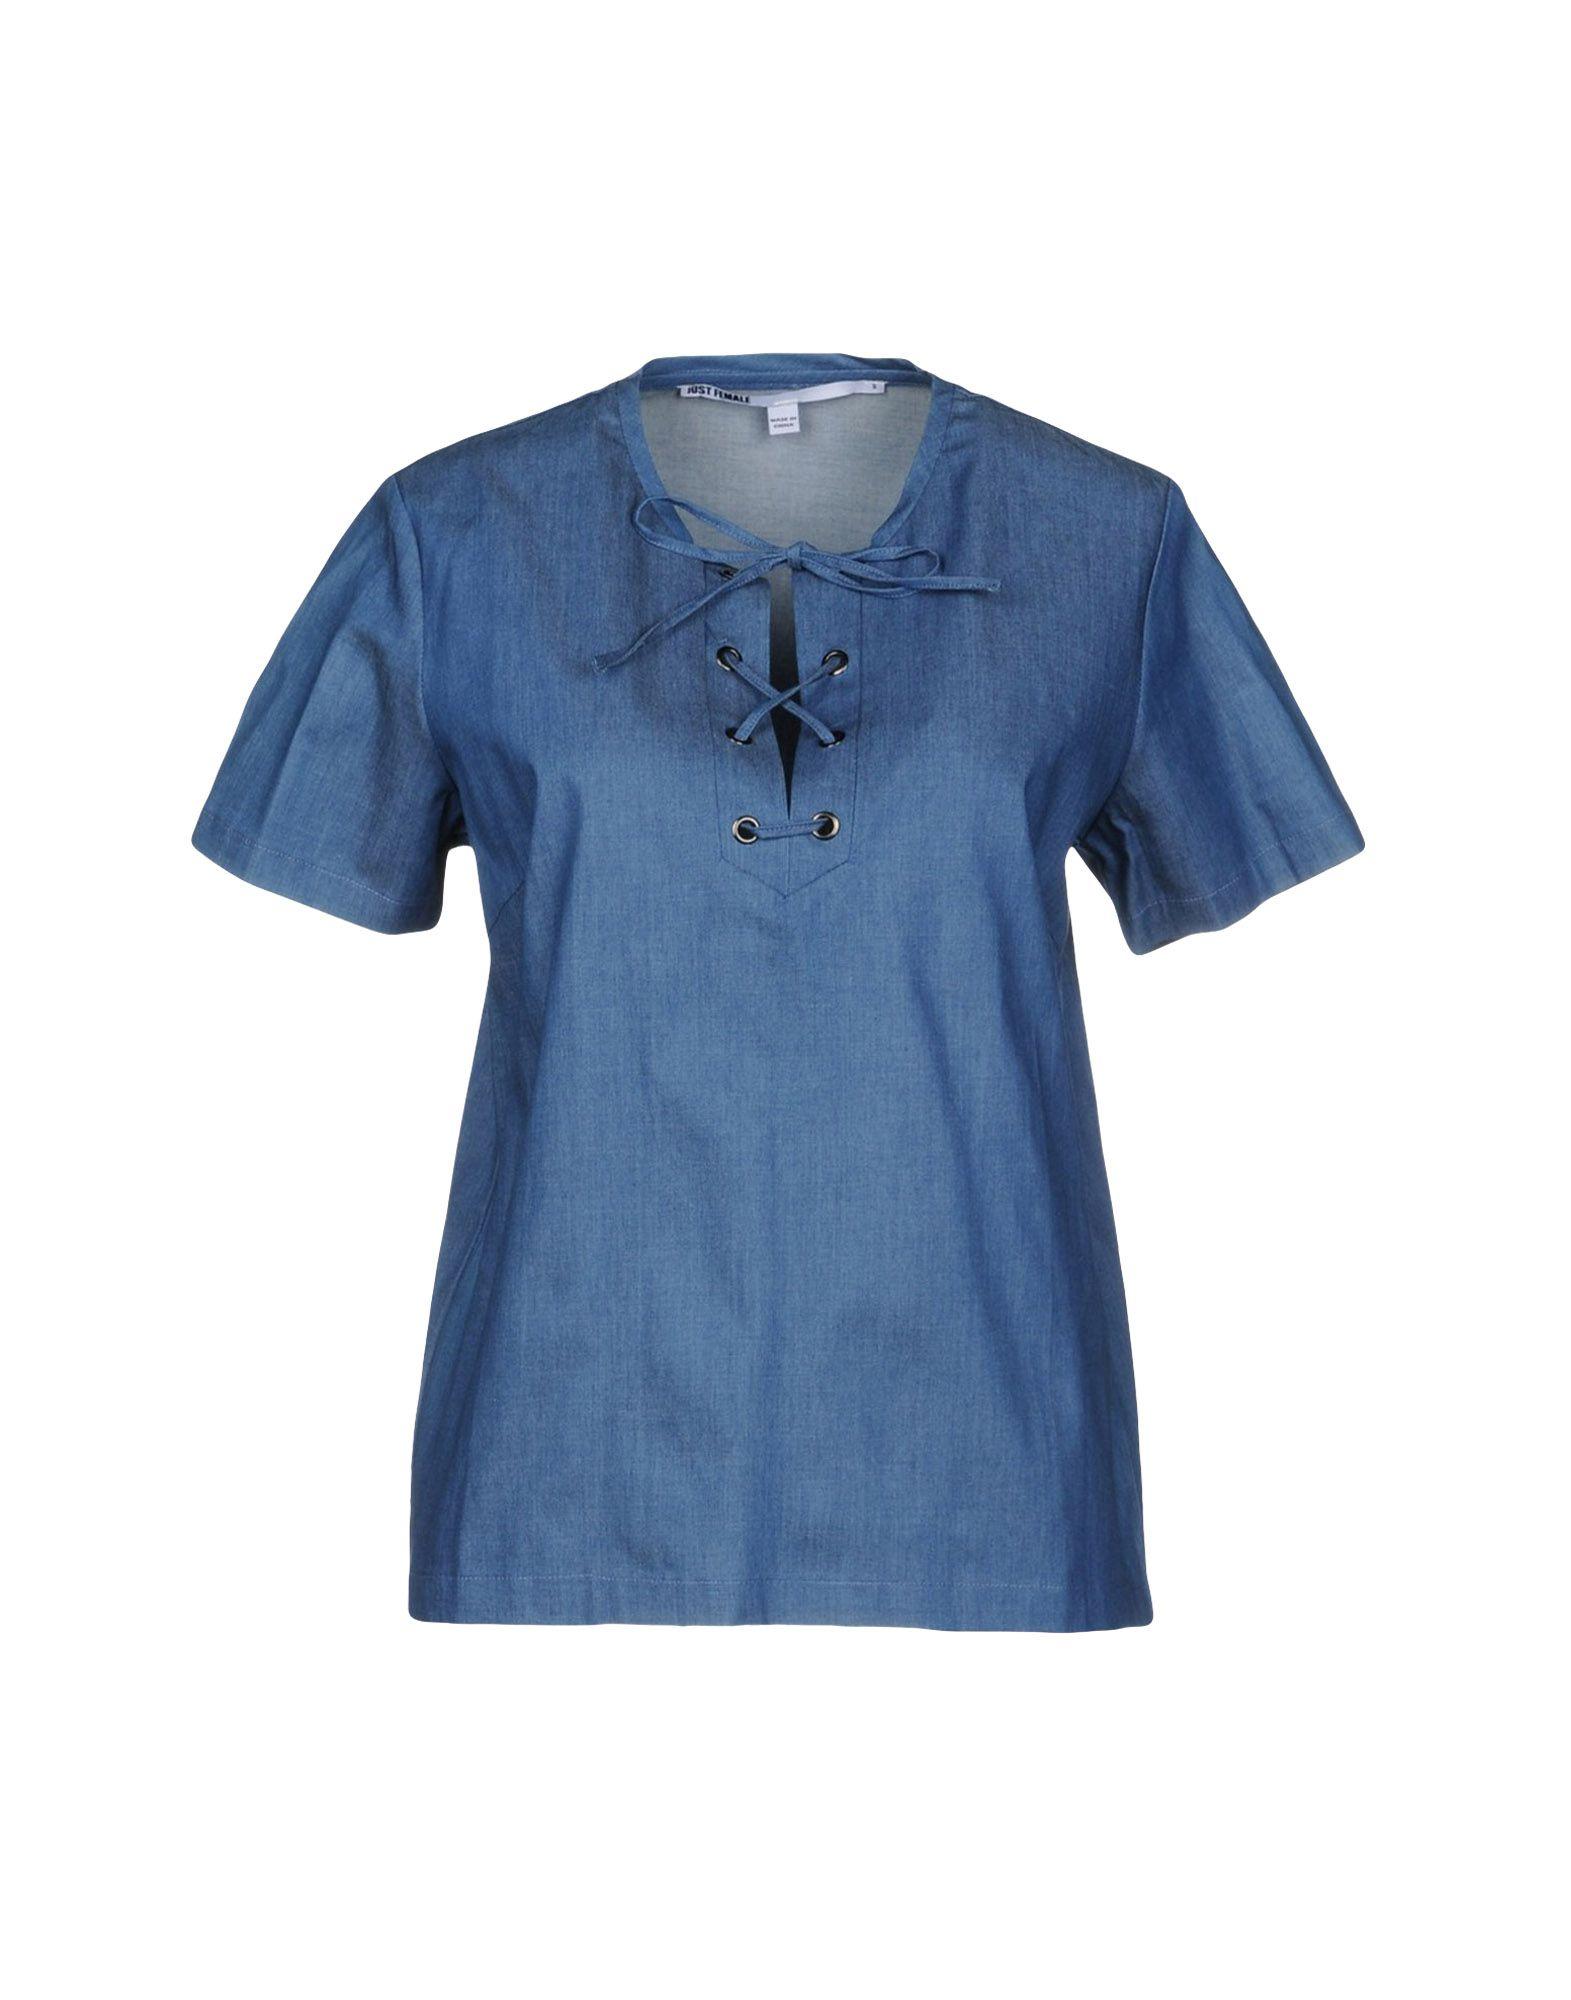 JUST FEMALE Denim Shirt in Blue